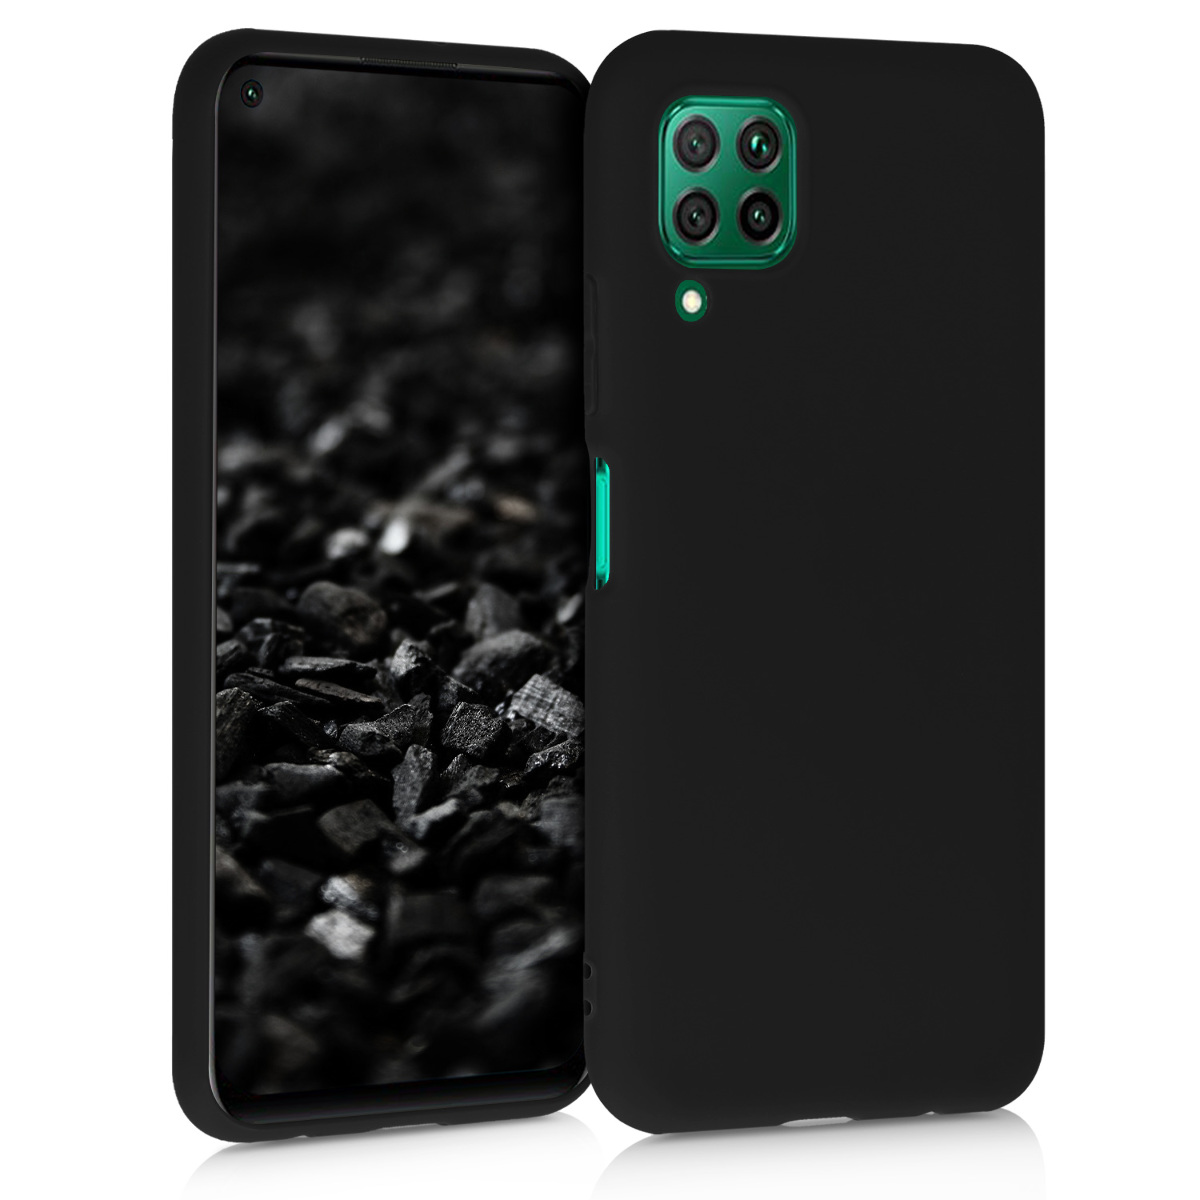 KW Θήκη Σιλικόνης Huawei P40 Lite - Black (51519.01)